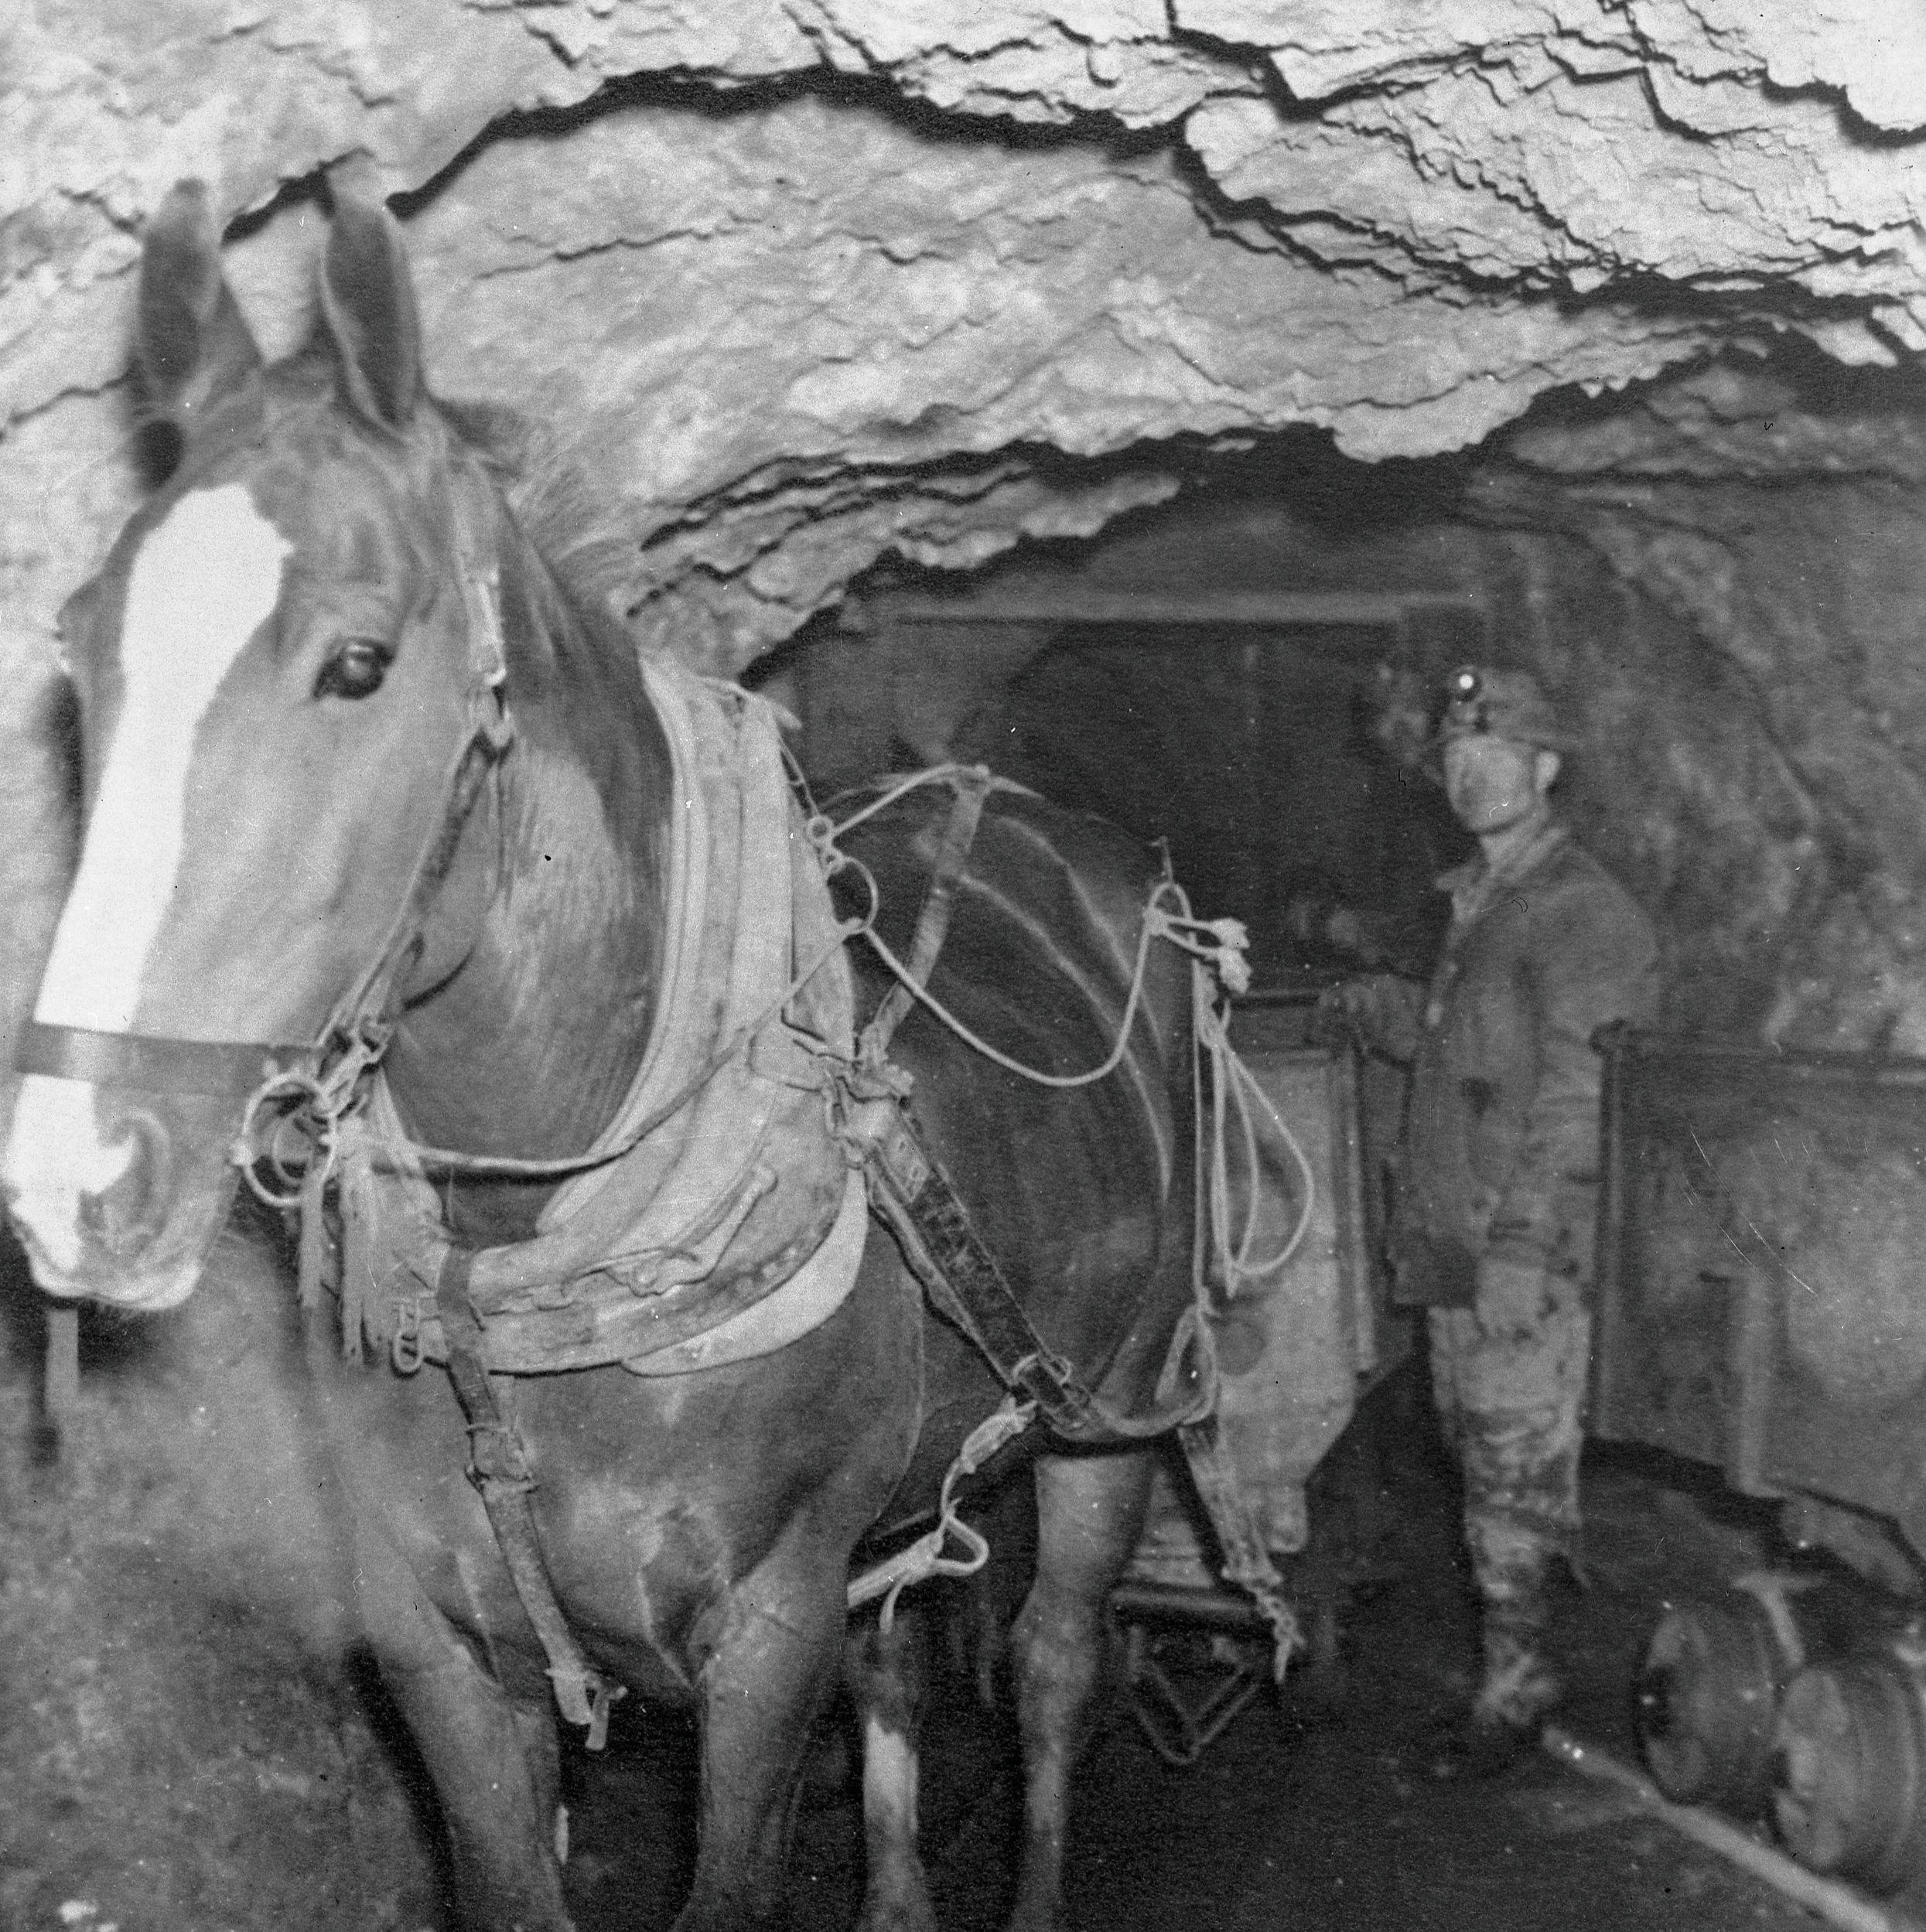 Park city summer 2012 horses mining c67xhb